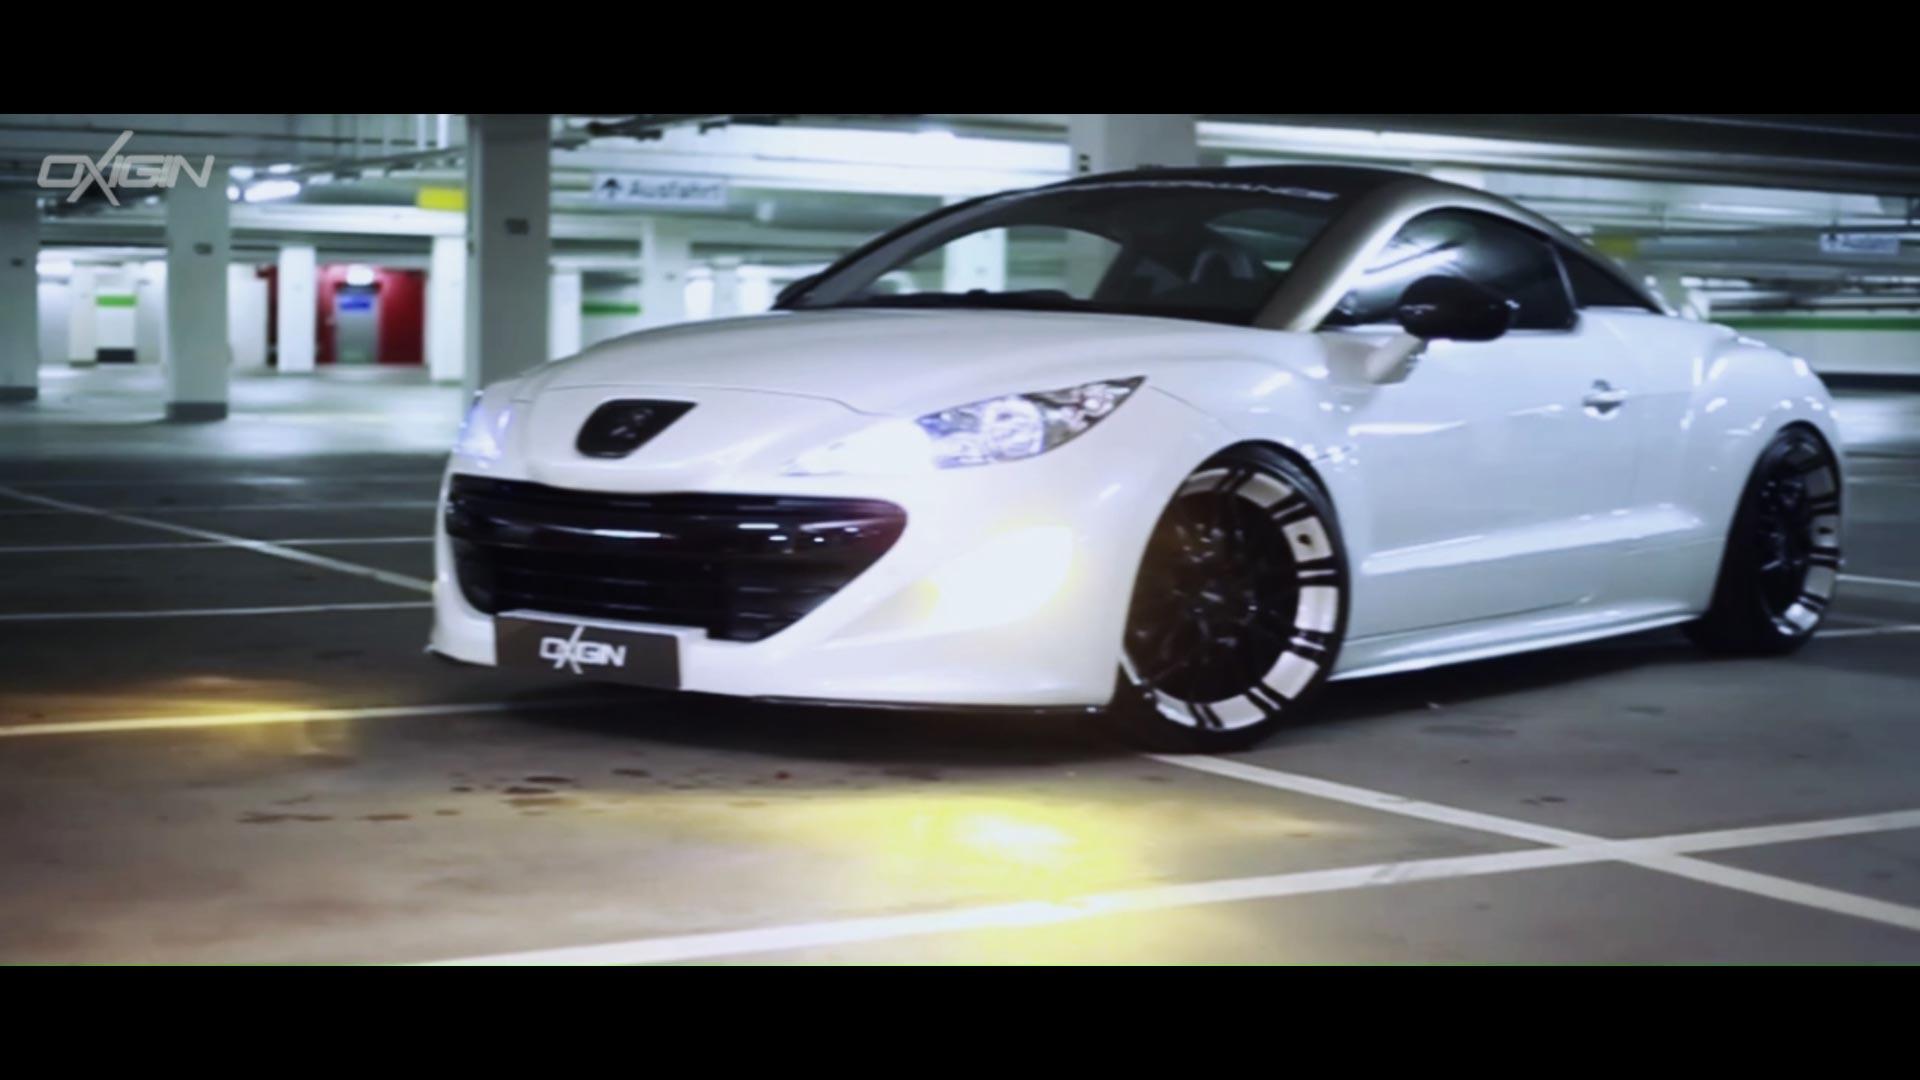 Peugeot RCZ mit OX14 Folie White